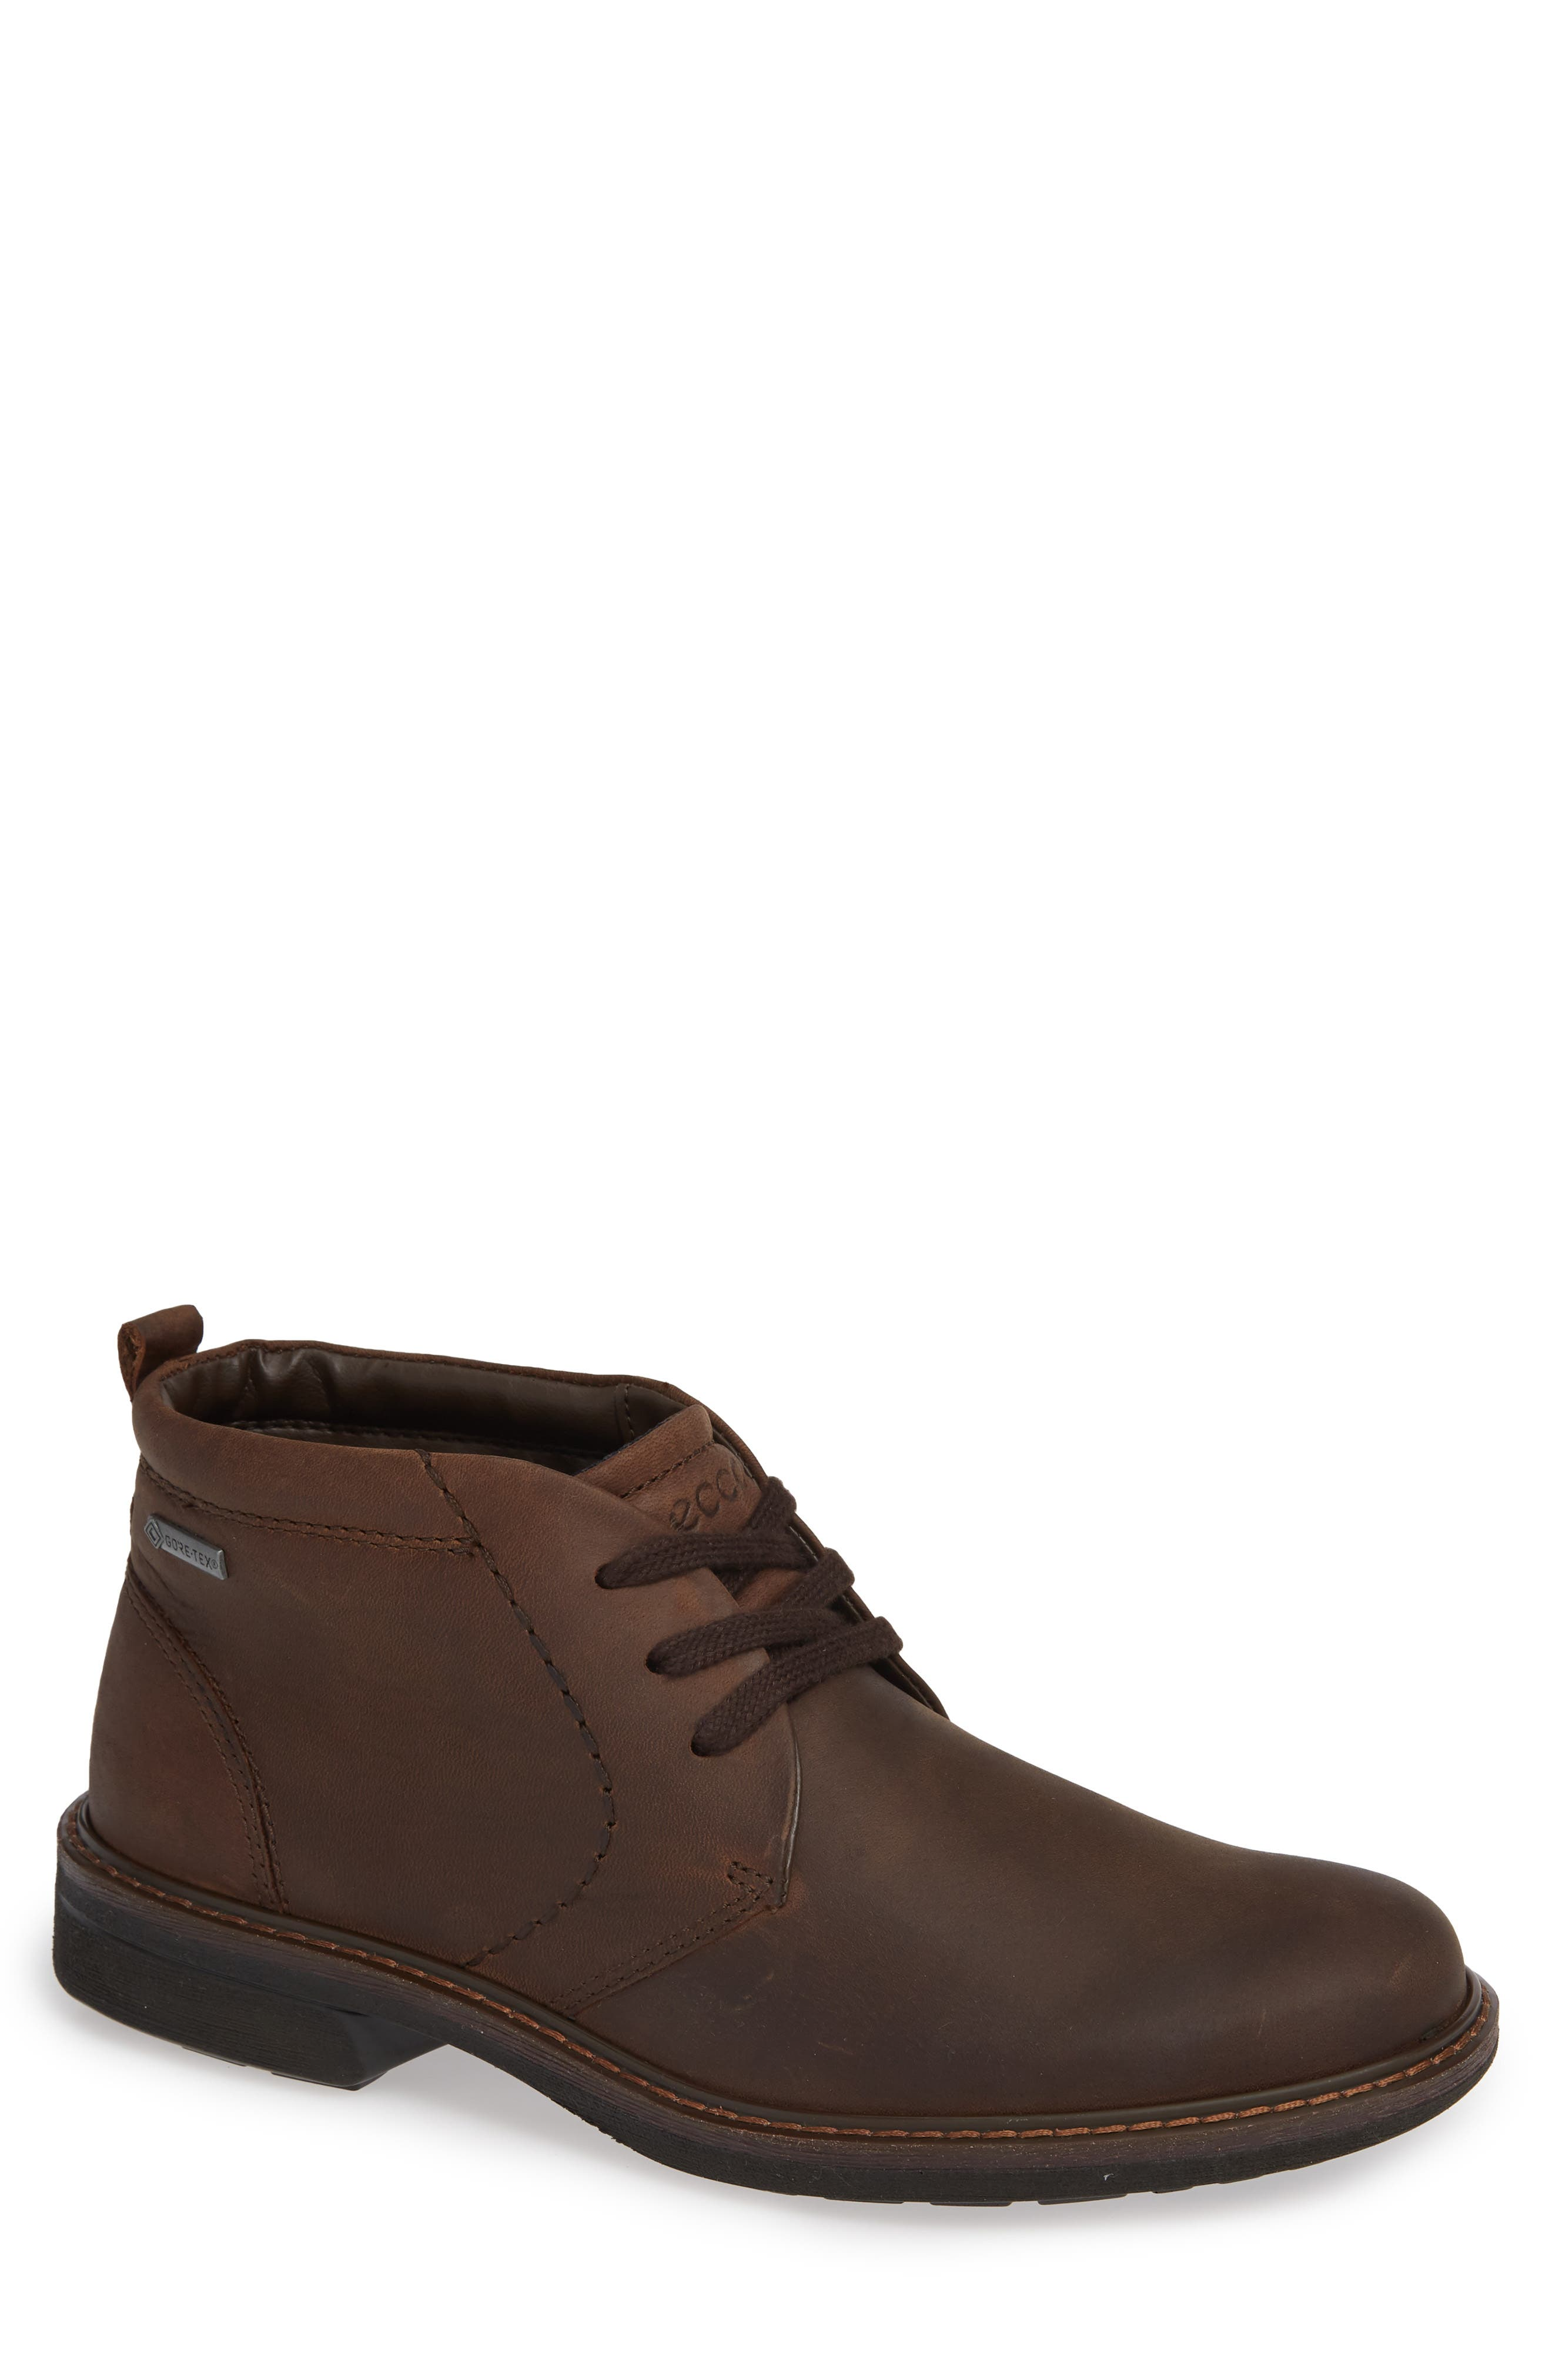 ECCO Turn Gore-Tex<sup>®</sup> Waterproof Chukka Boot, Main, color, COCOA BROWN